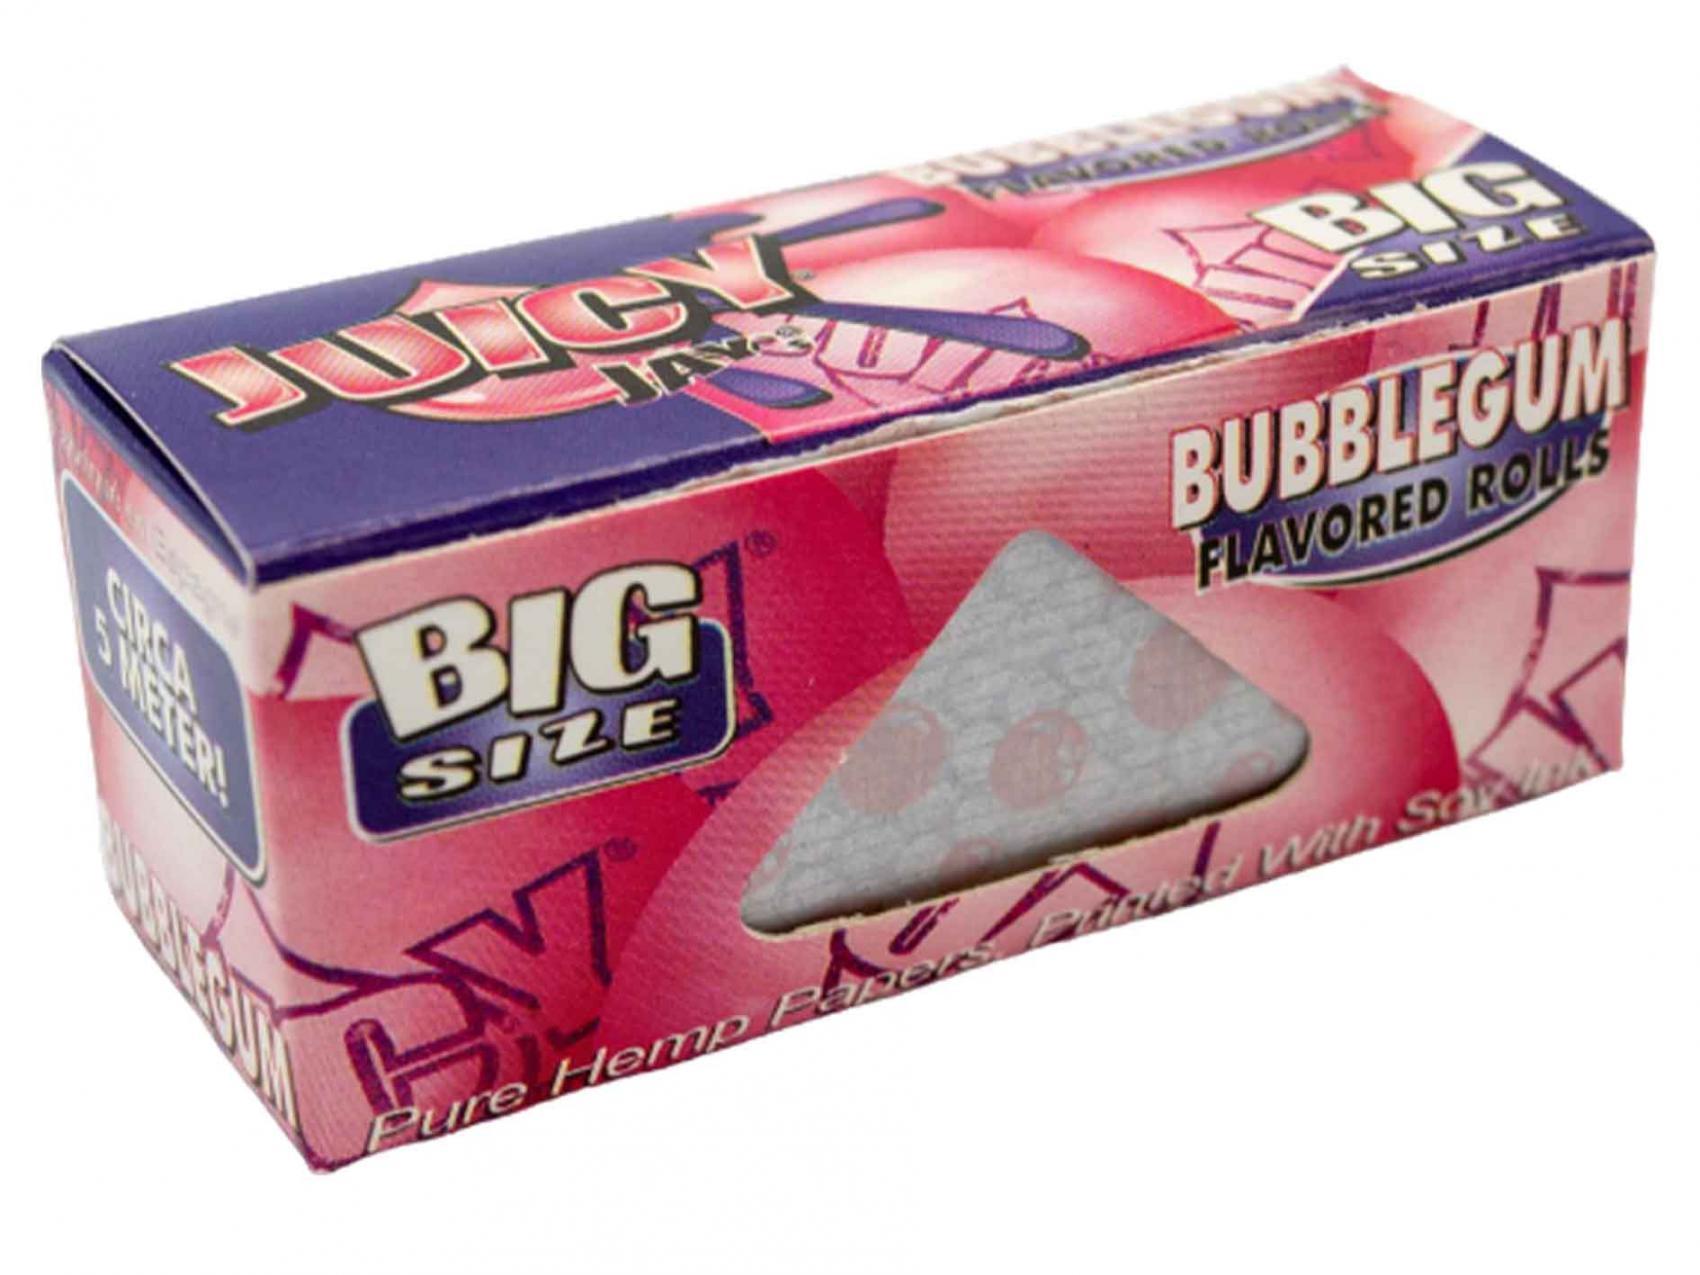 Juicy Jays Bubblegum